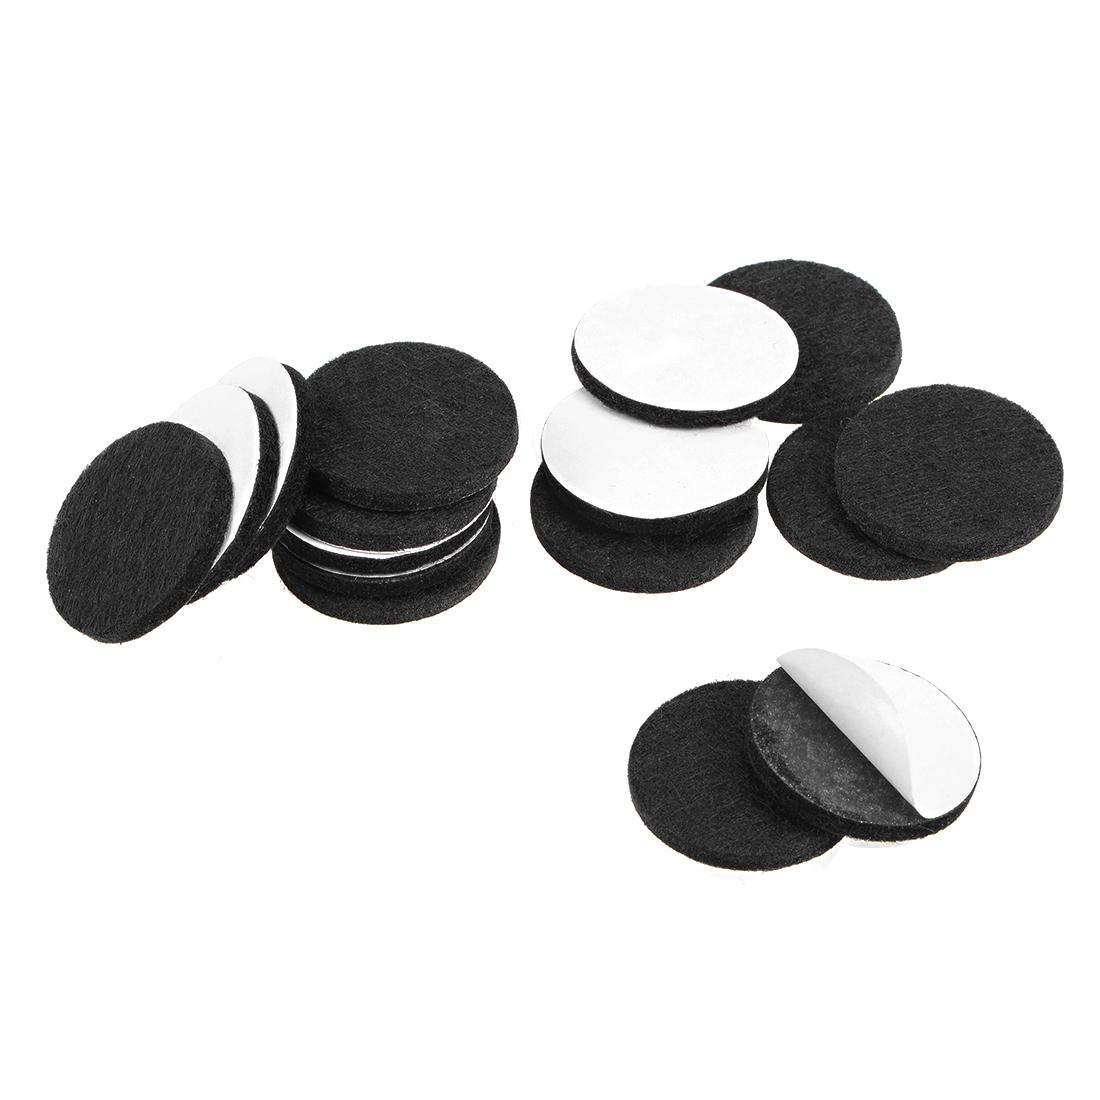 Furniture Pads Adhesive Felt Pads 30mm Diameter 3mm Thick Round Black 36Pcs